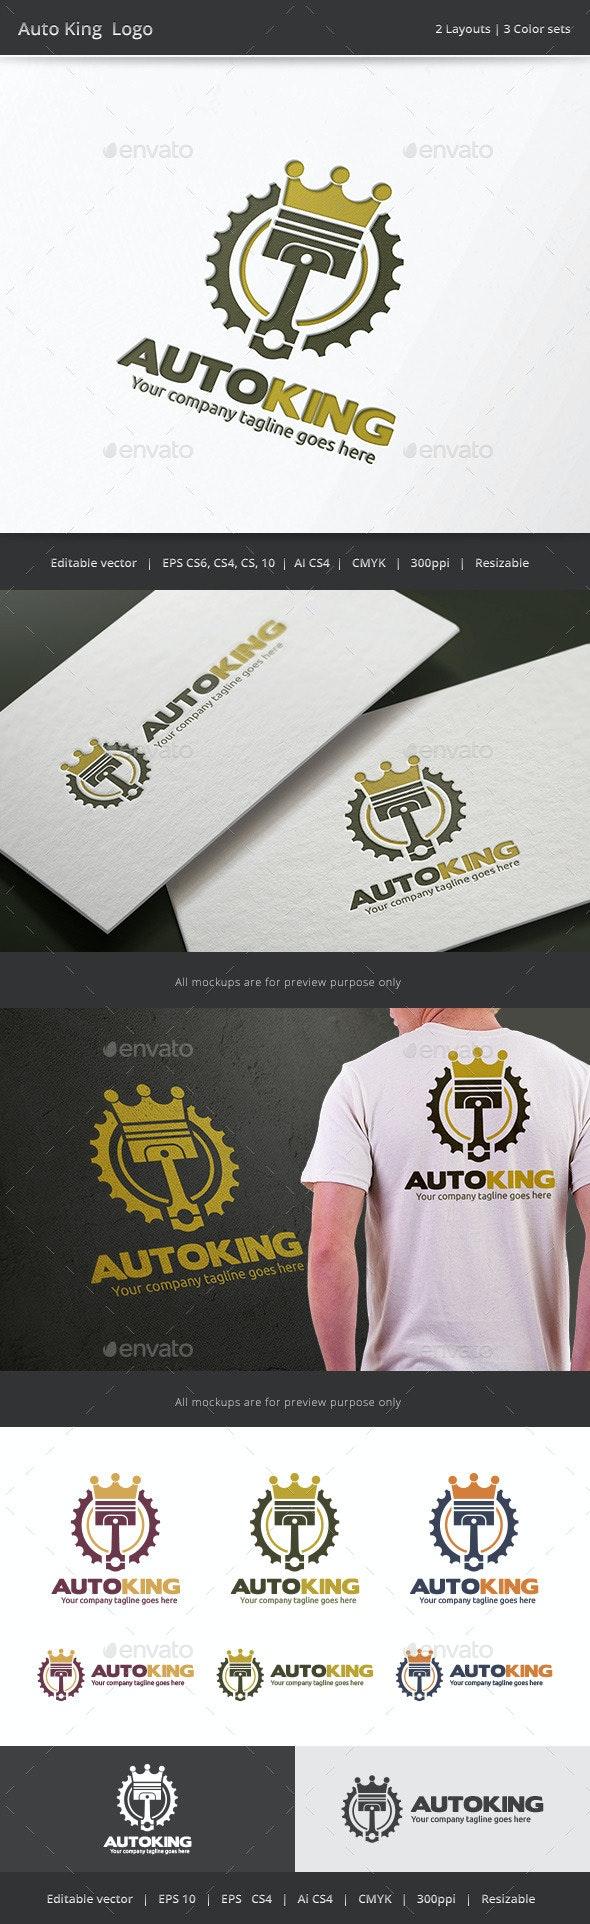 Auto King Piston Logo - Objects Logo Templates